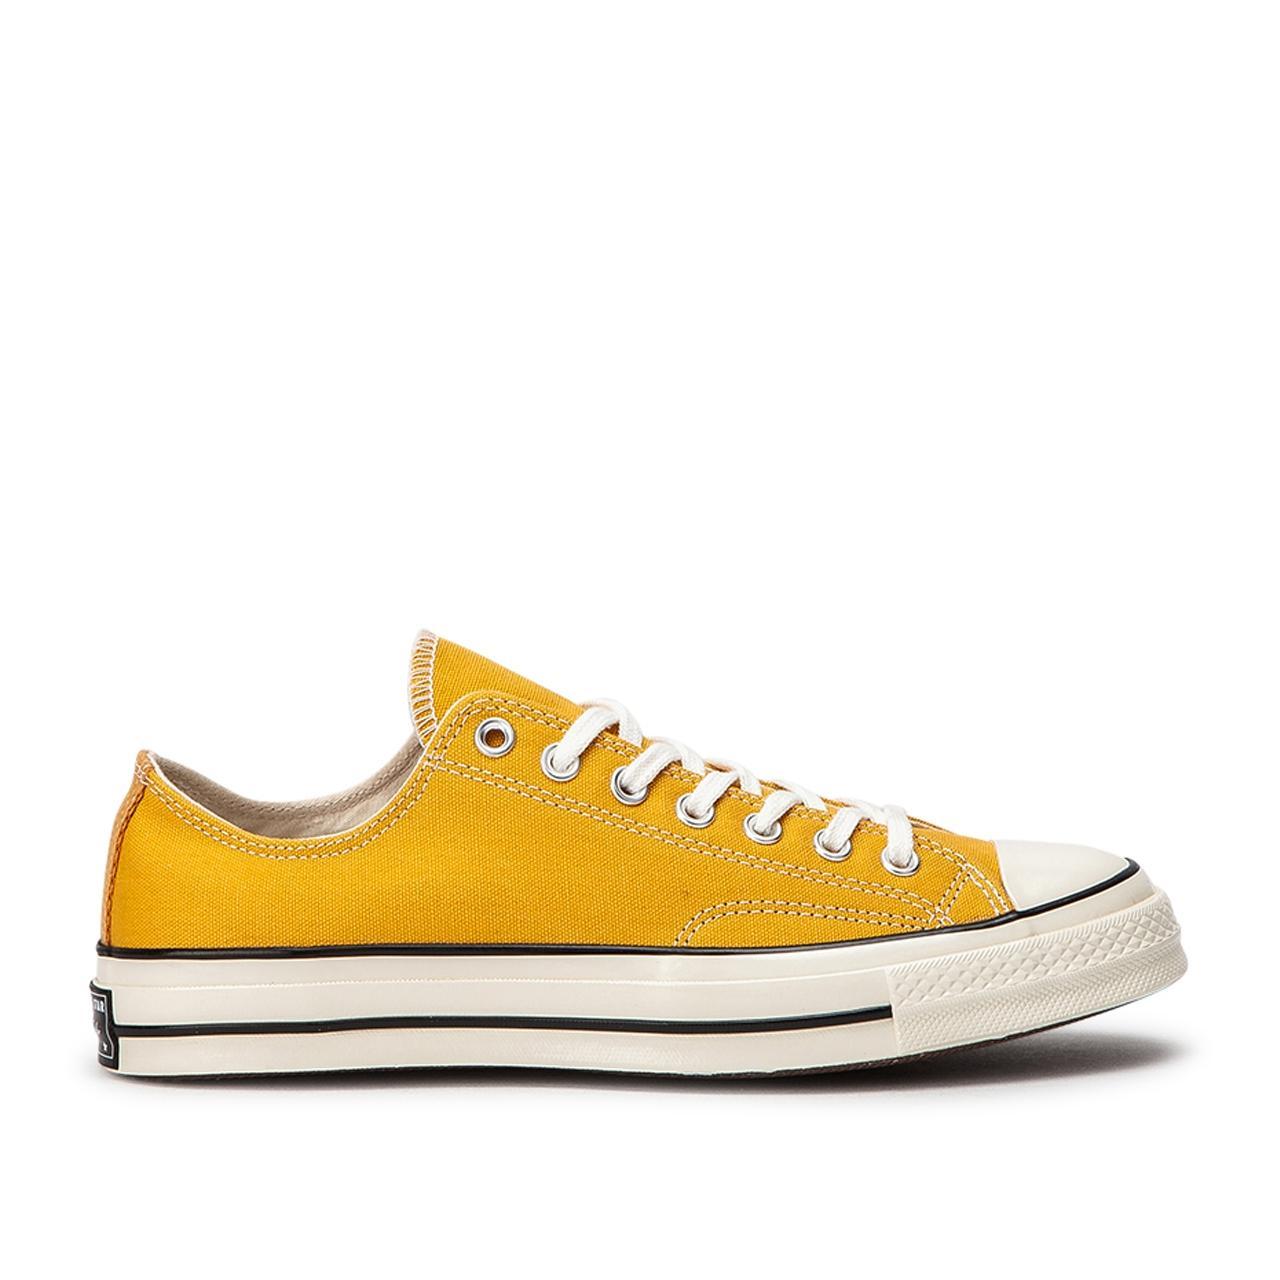 converse chuck taylor 1970 yellow off